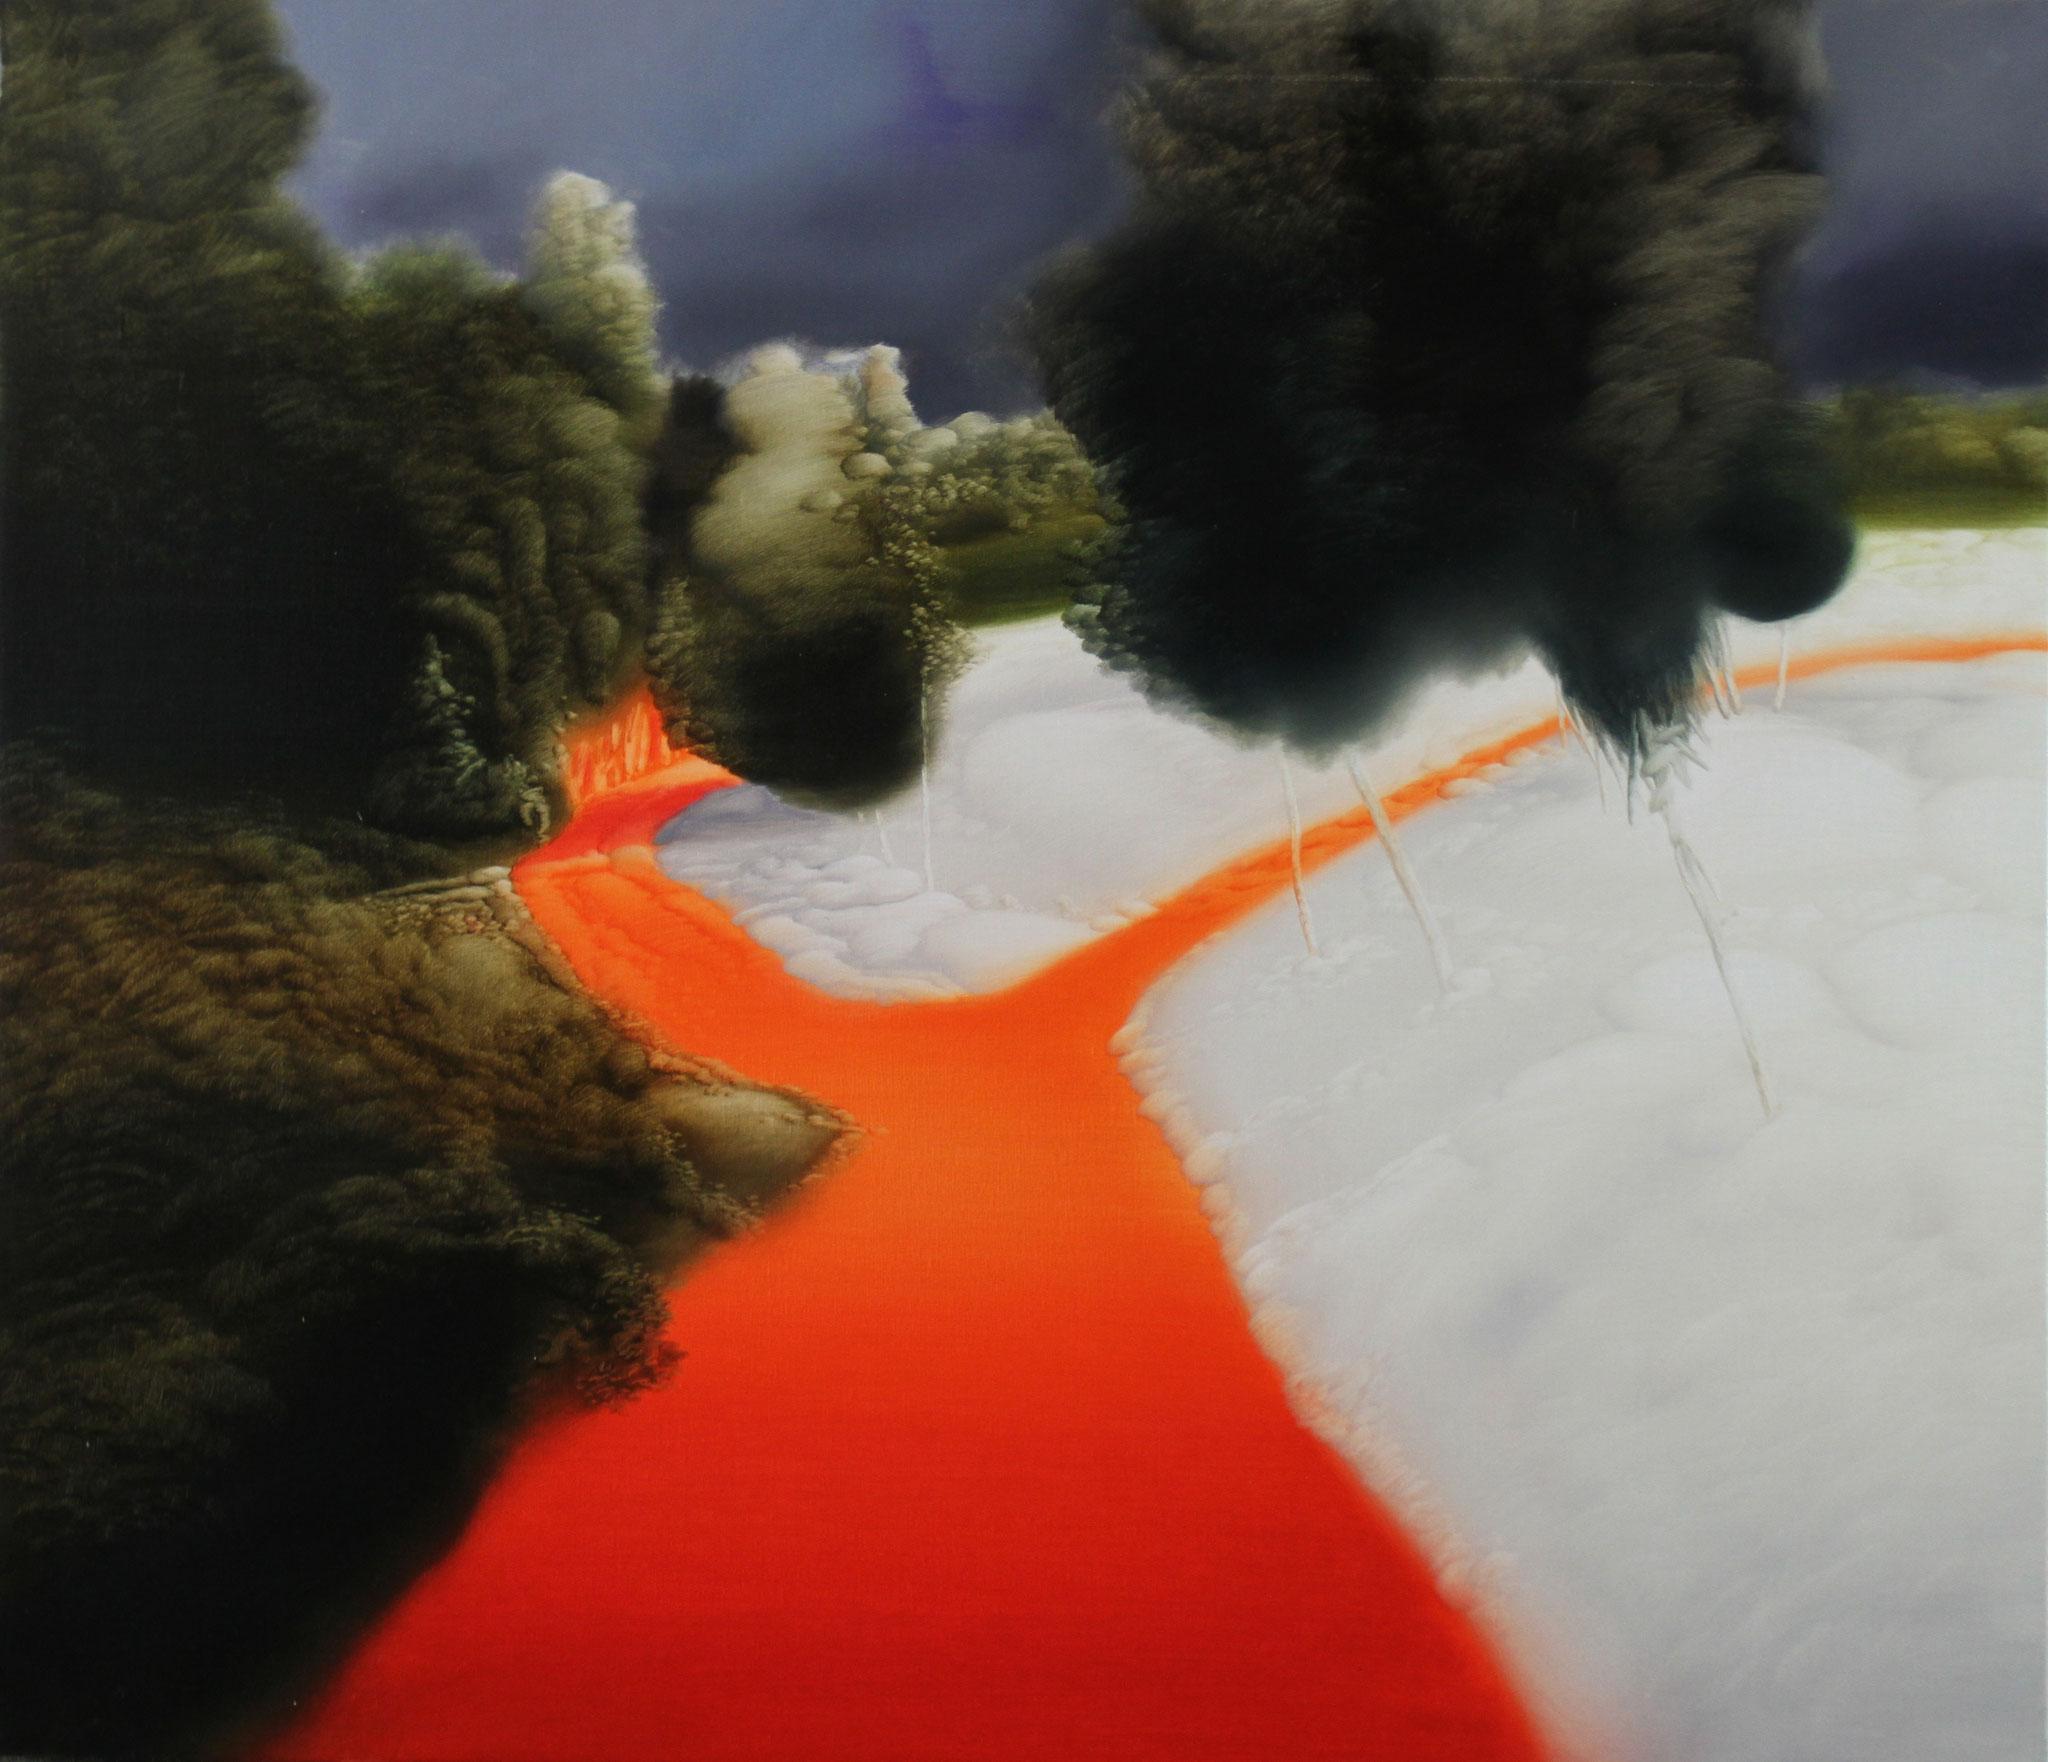 Weiß Orange, 2005, Öl auf Leinwand, 90cm x 105cm